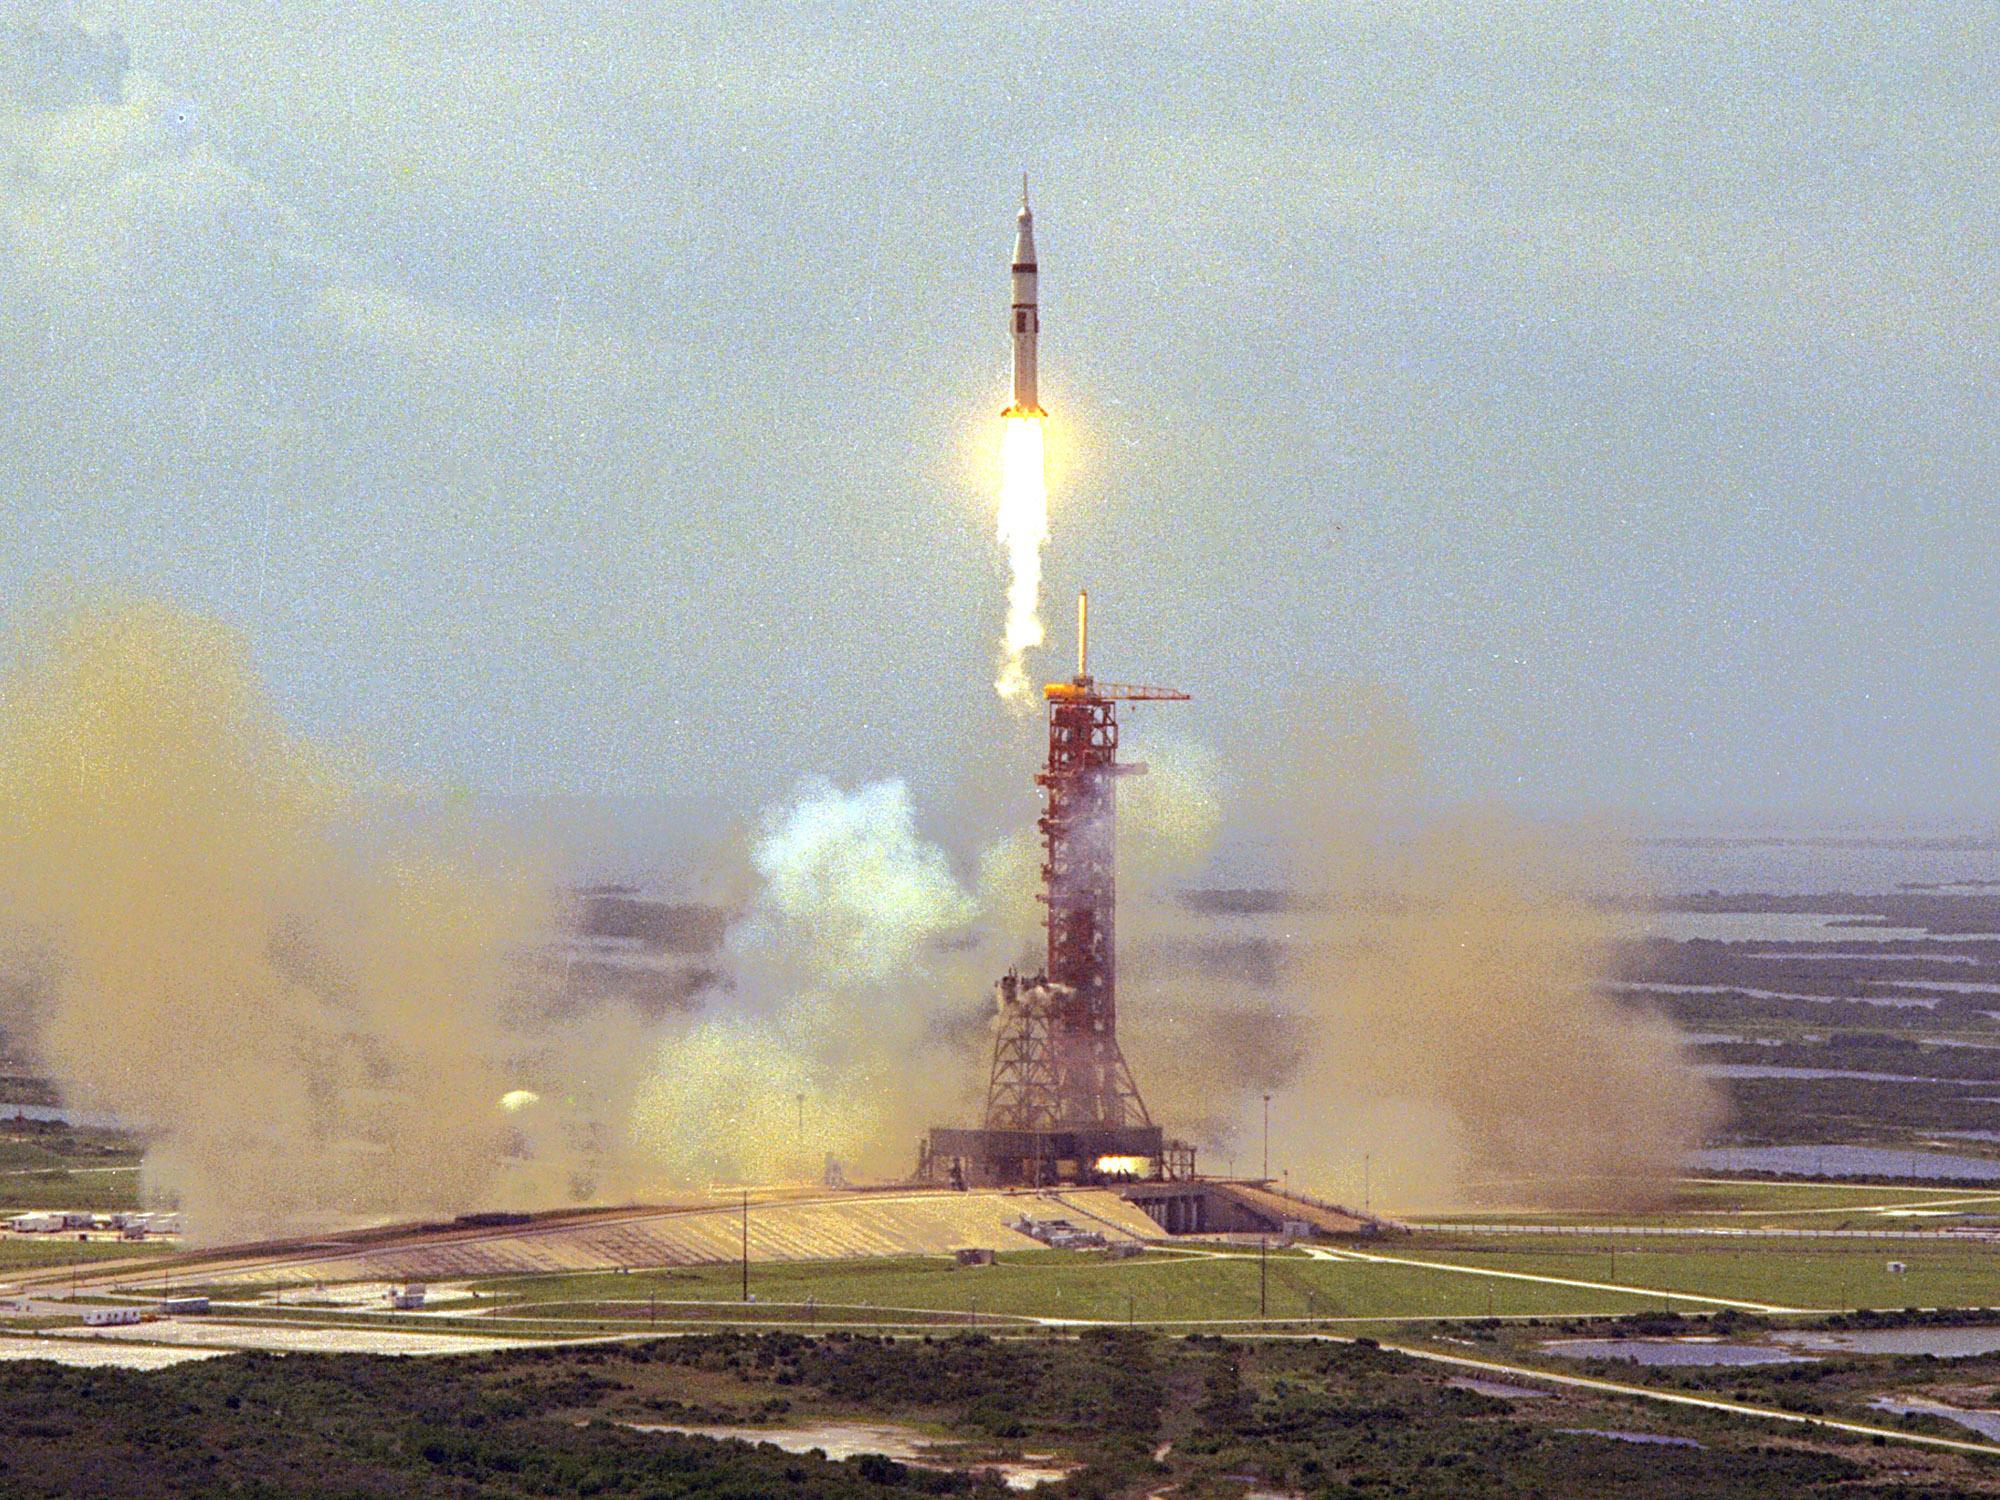 apollo spacecraft launch configuration - photo #33